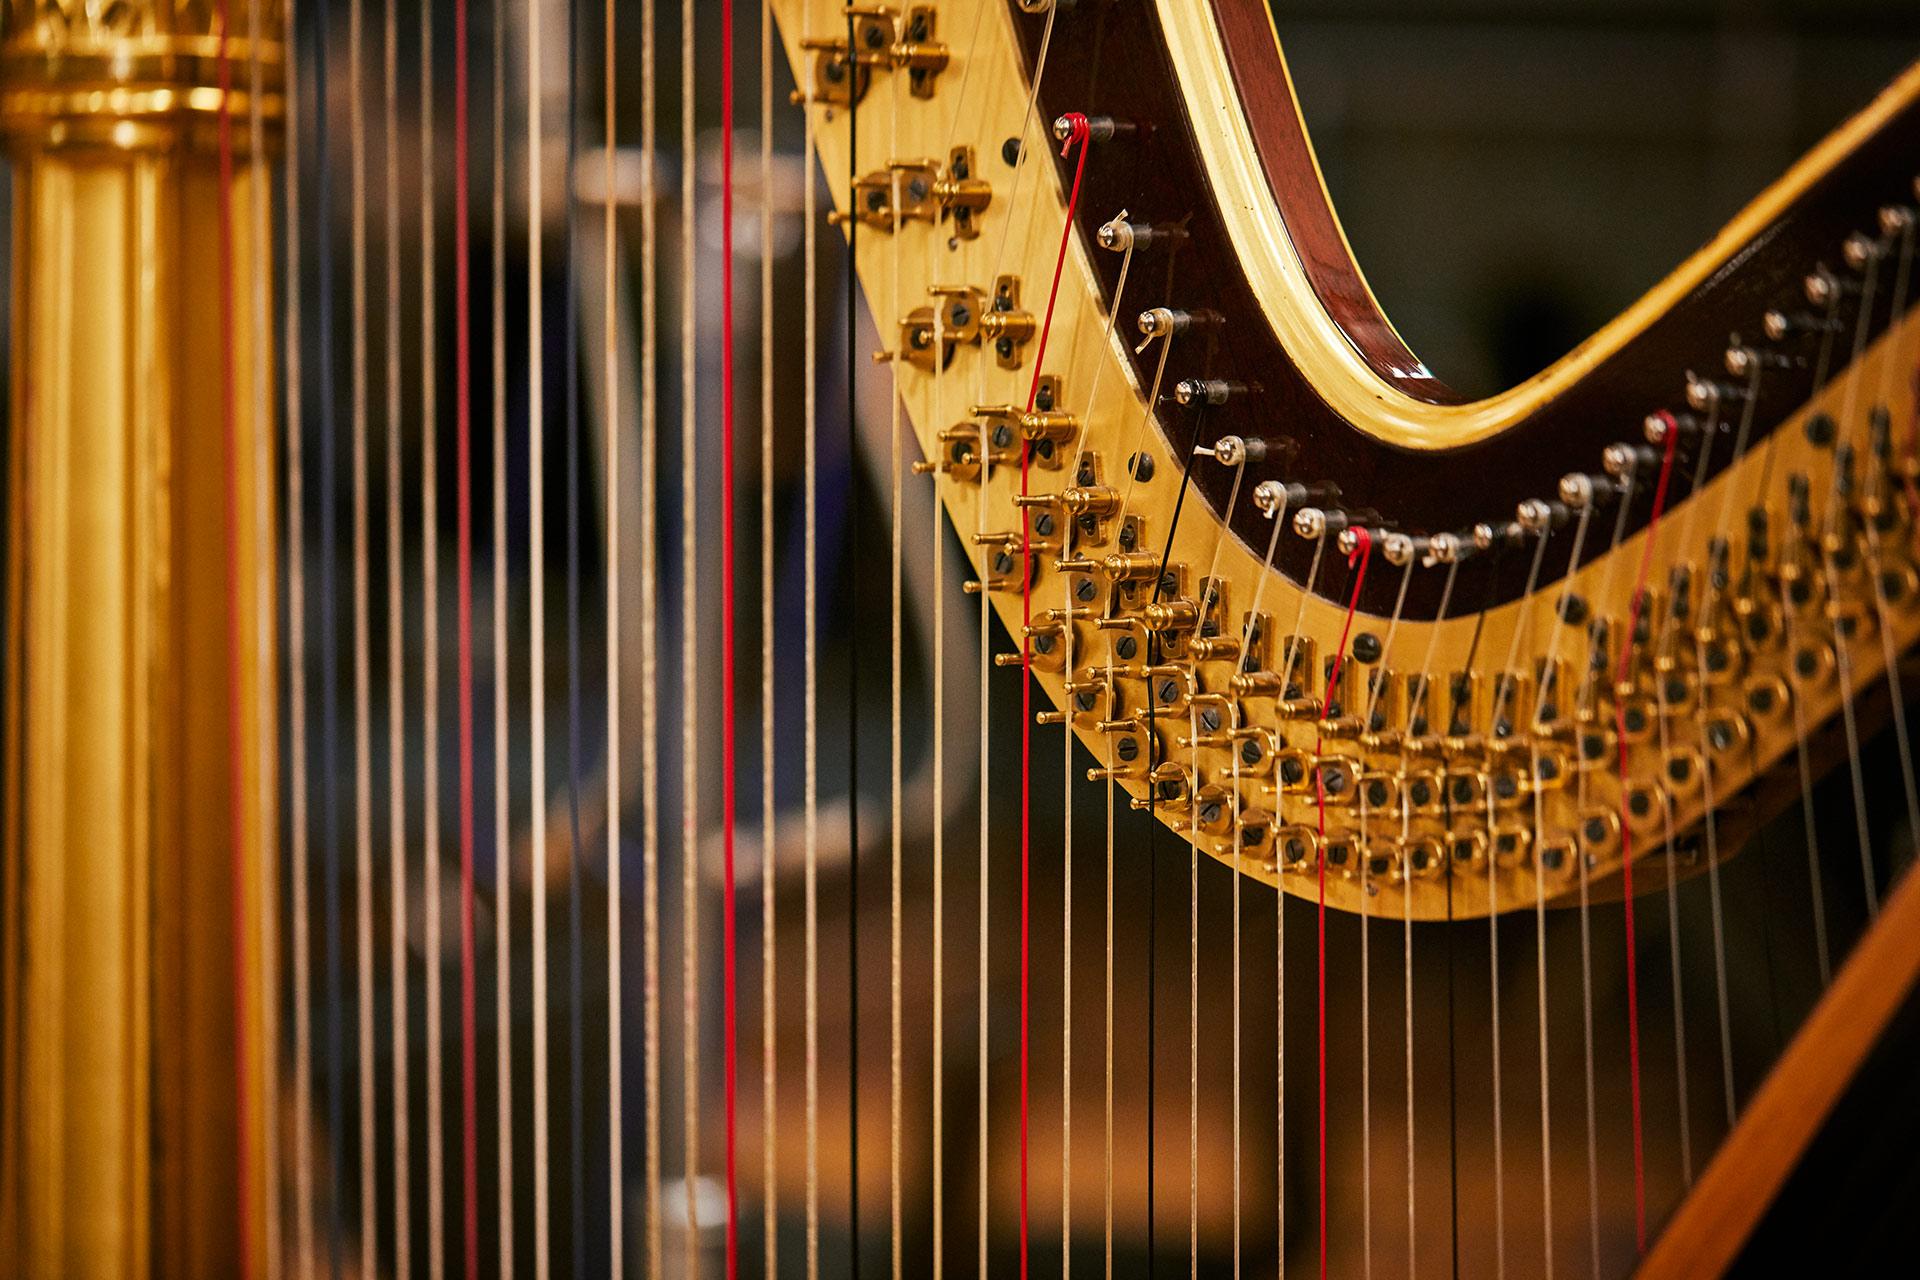 spitfire harp